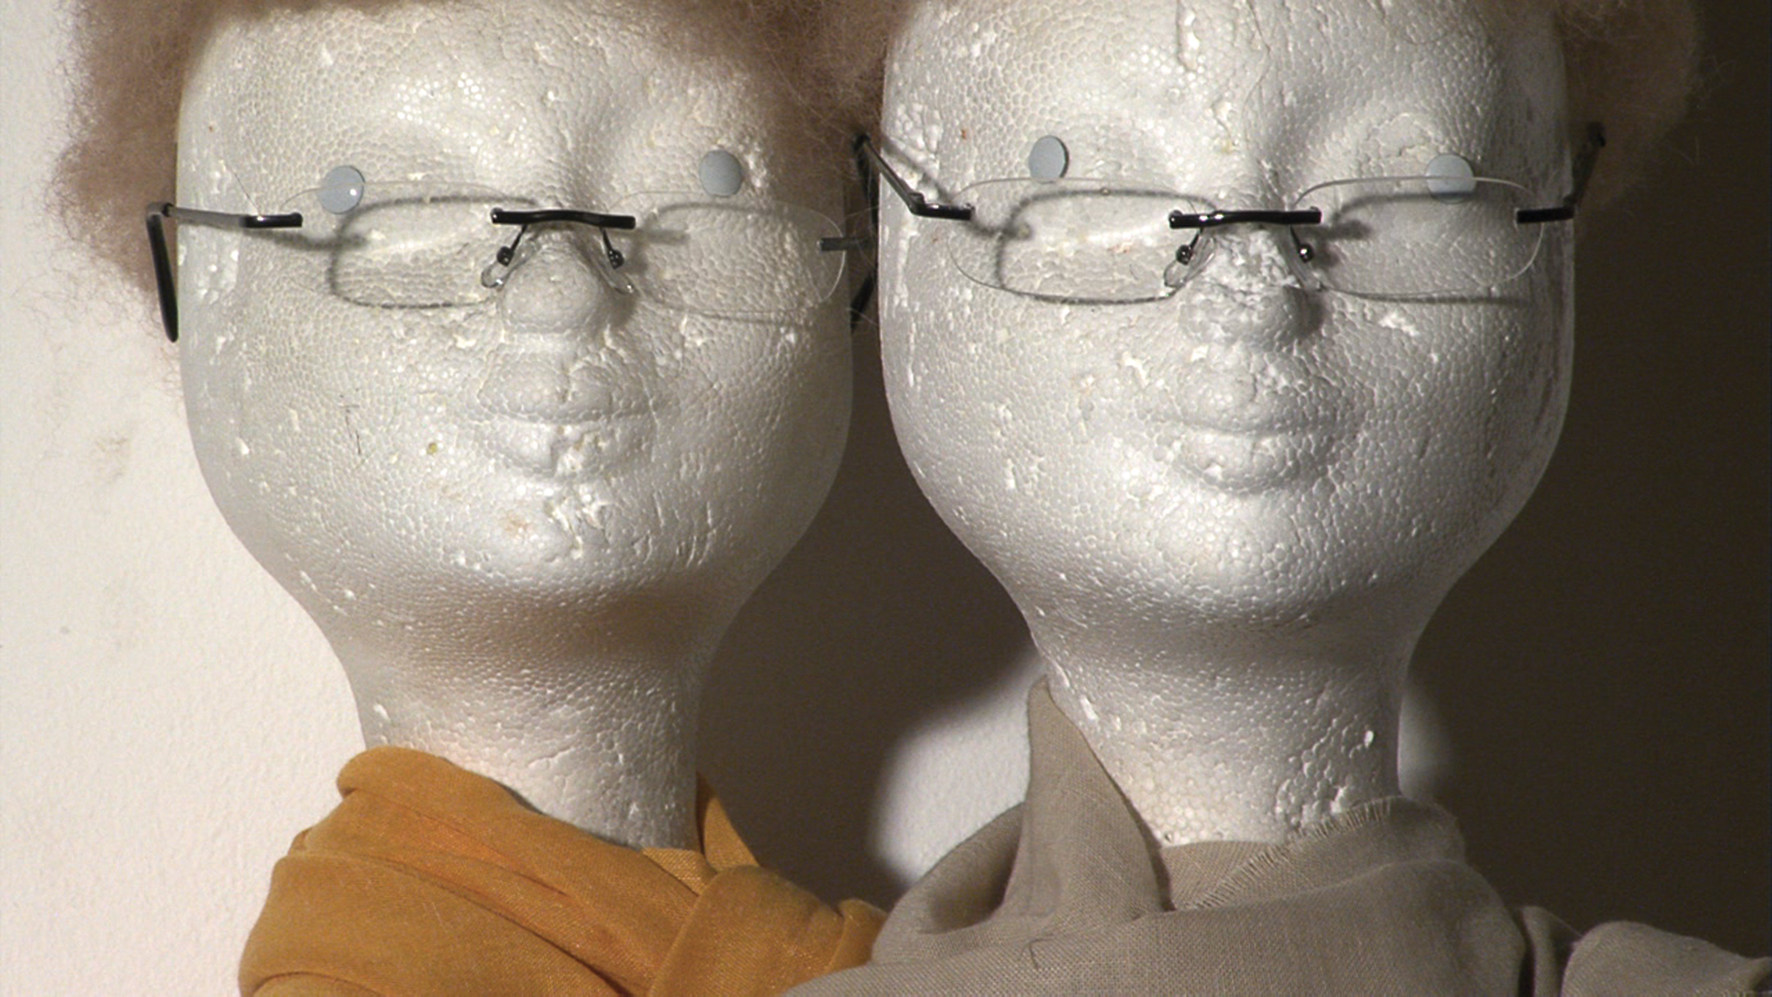 Jos de Gruyter et Harald Thys, courtesy galerie Micheline Szwajcer